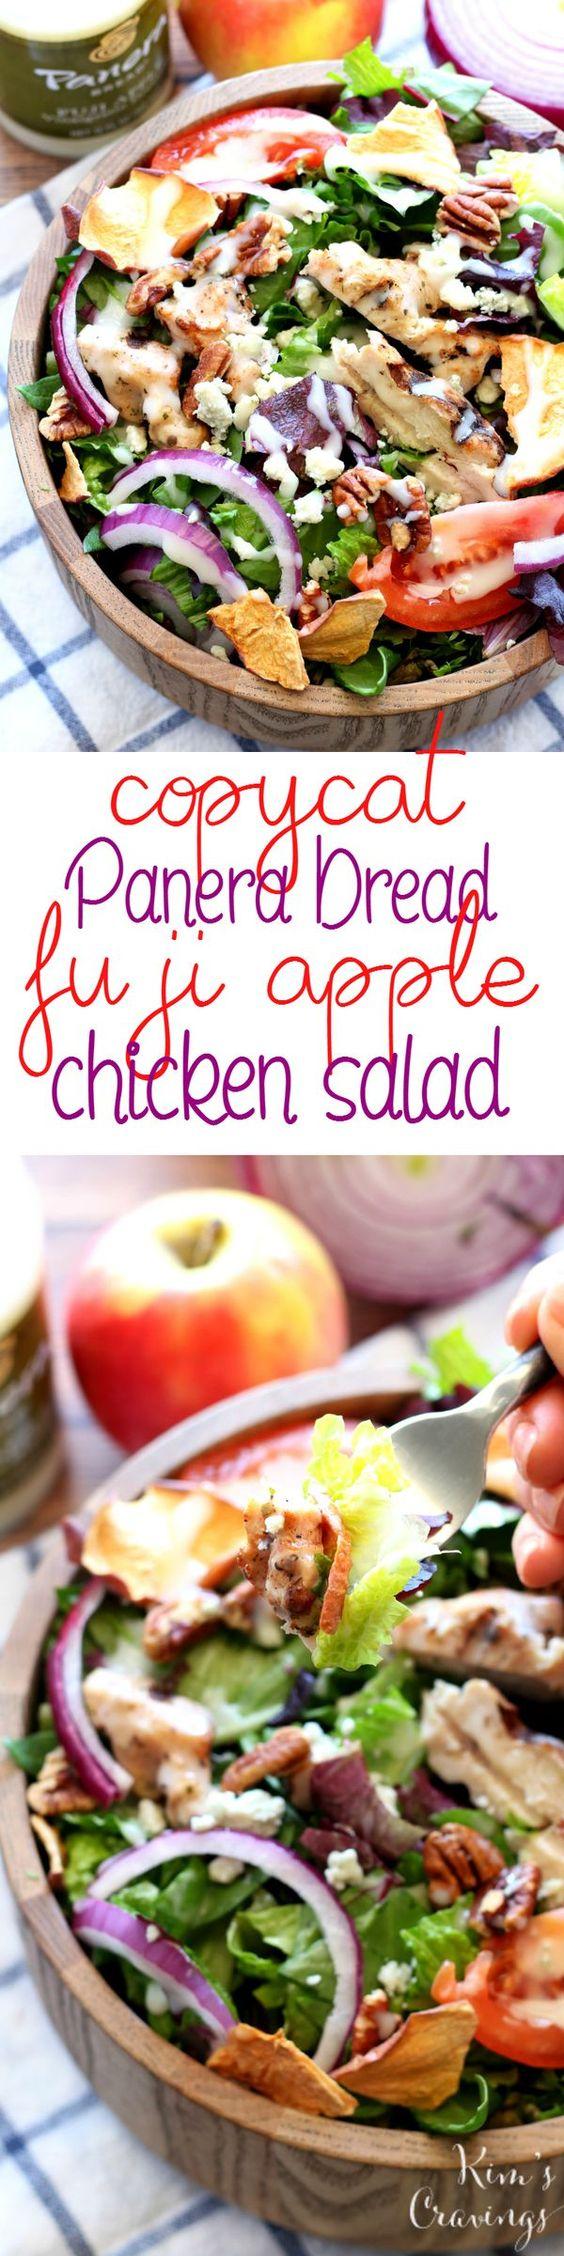 Copycat Panera Bread Fuji Apple Chicken Salad - a fresh flavorful salad that tastes even more delicious than the original!